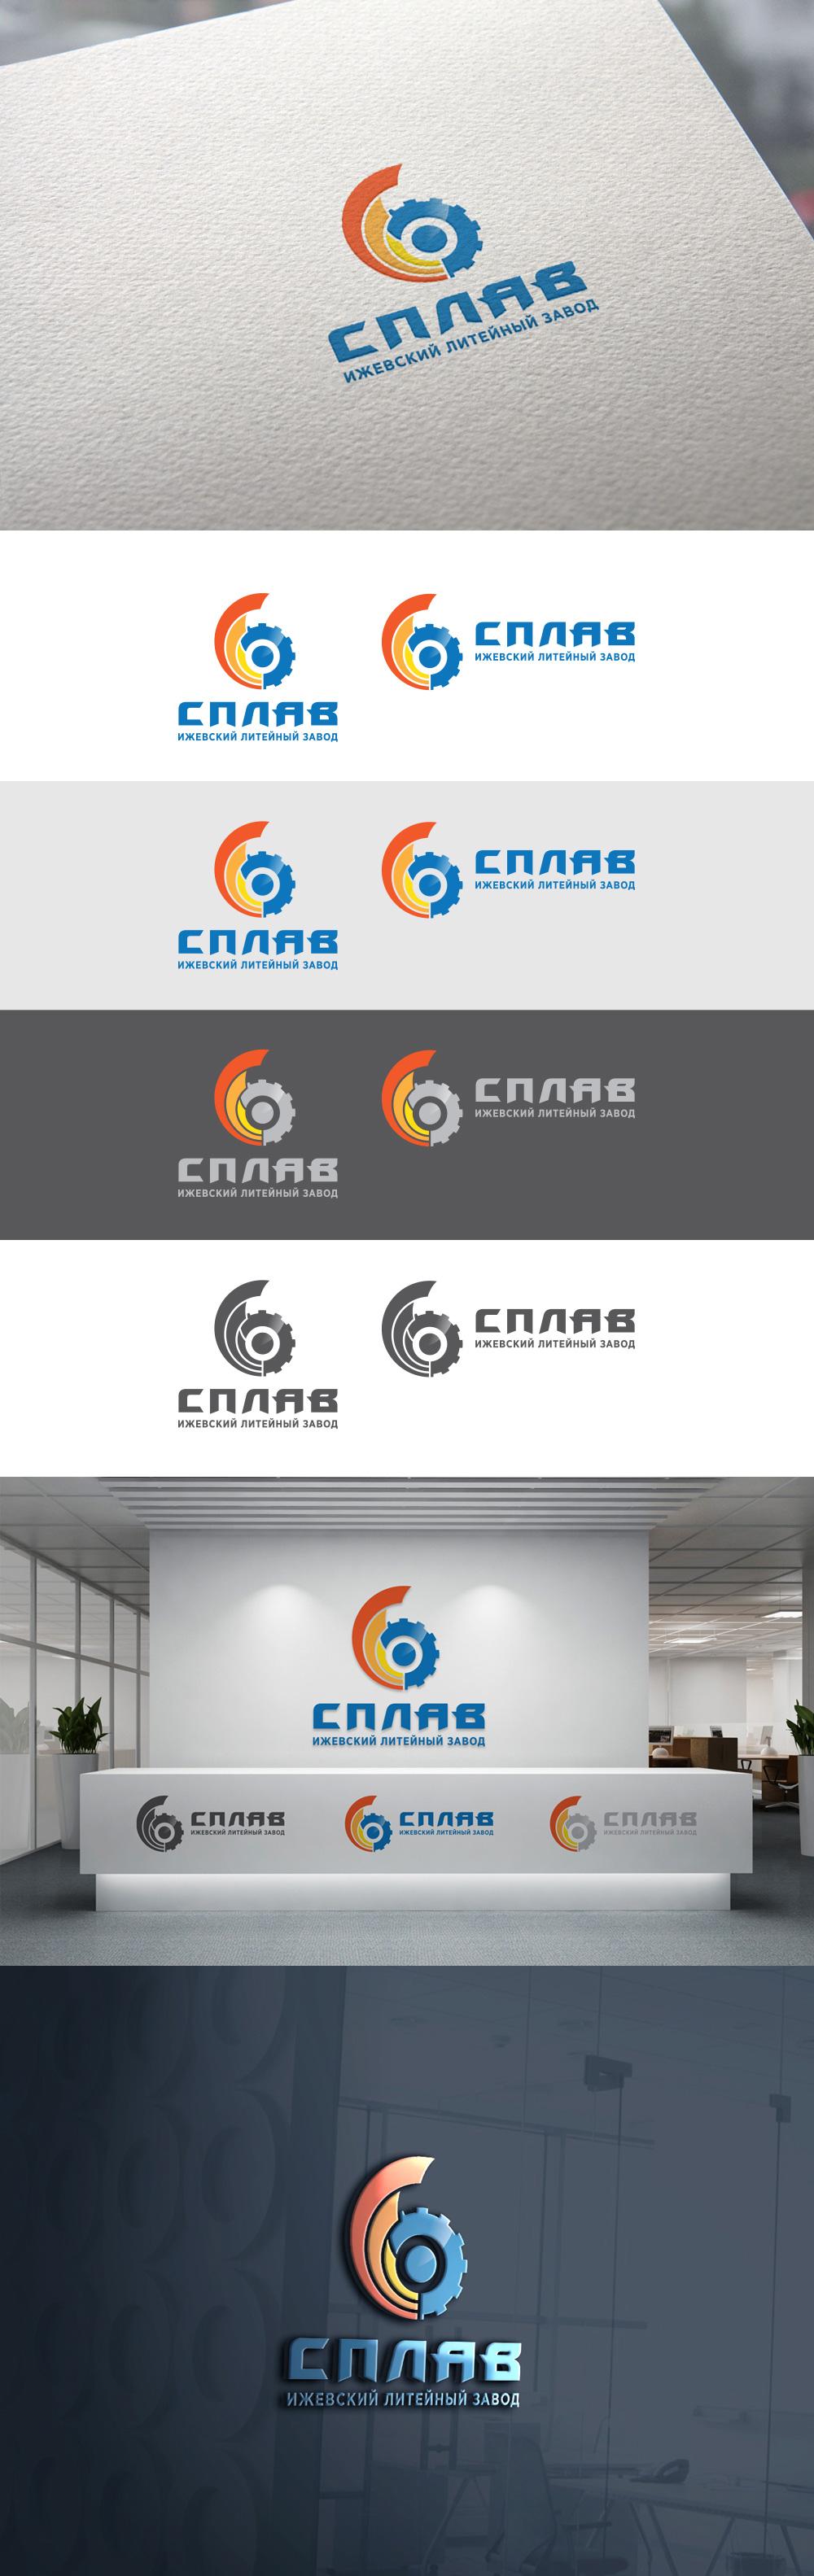 Разработать логотип для литейного завода фото f_8085b12cd0e44568.jpg